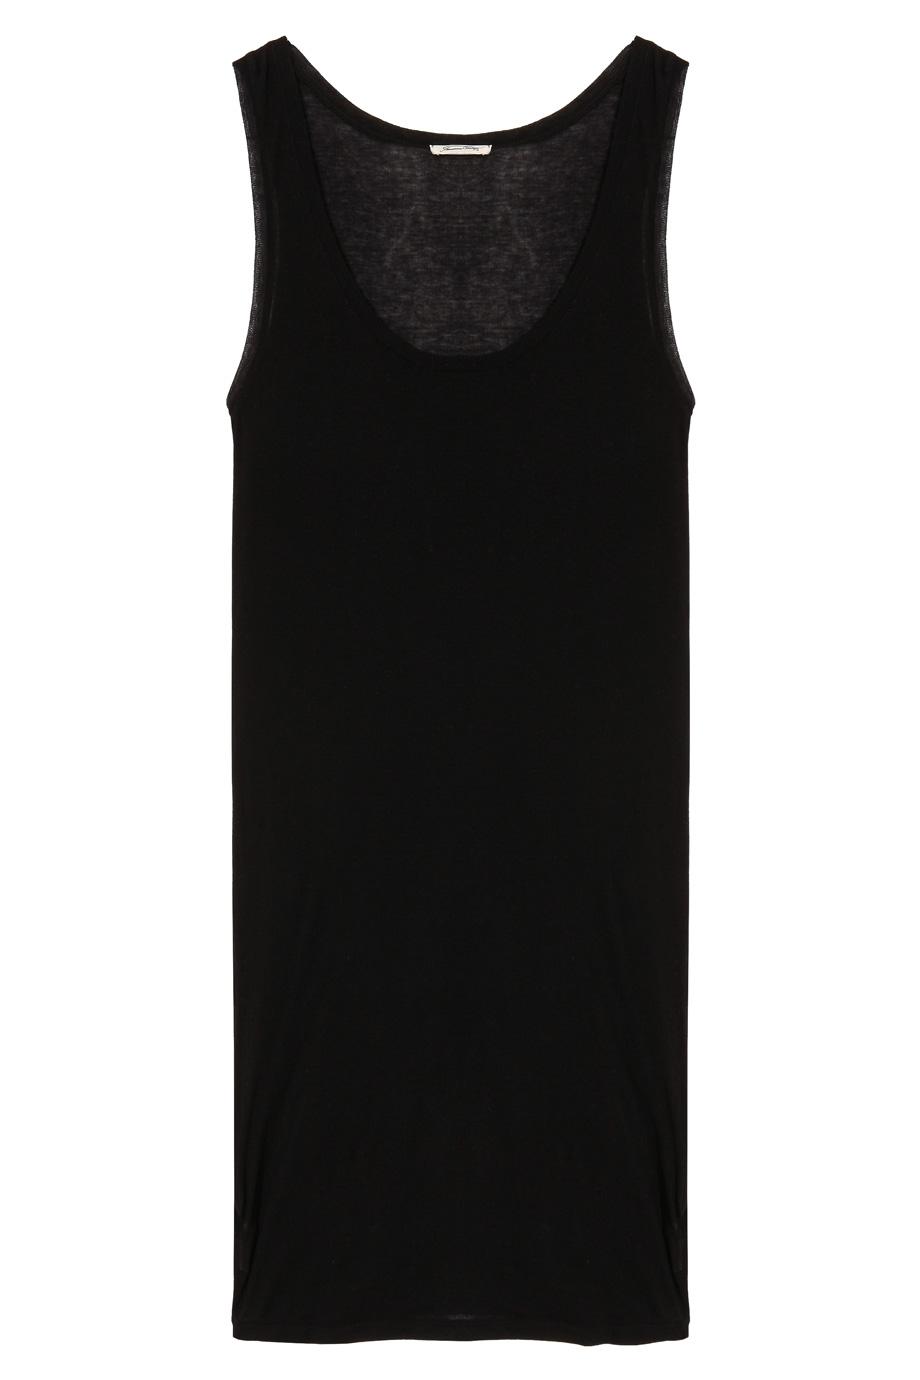 american vintage massachusetts tank dress in black lyst